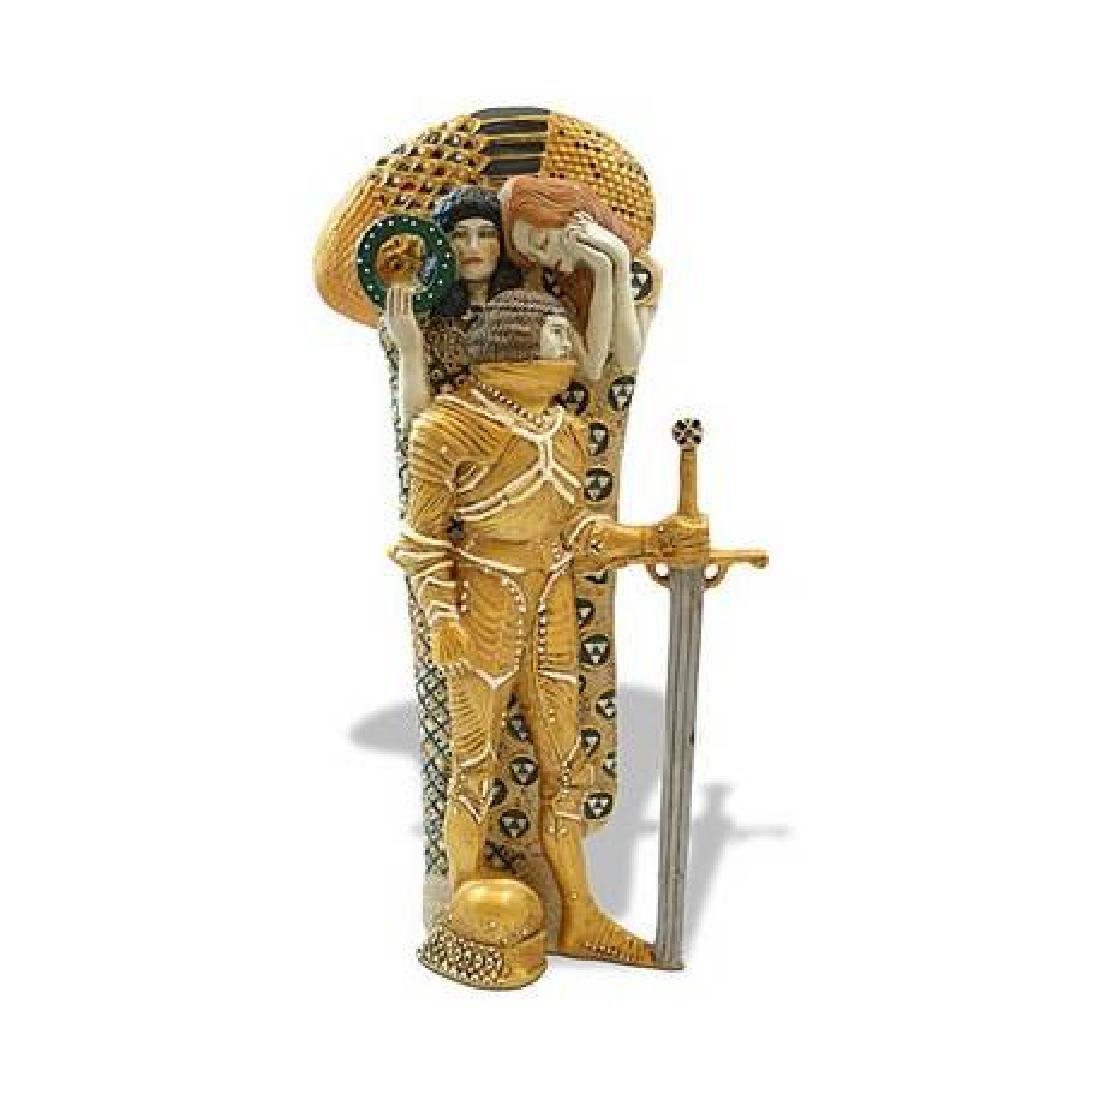 After Gustav Klimt: The Knight statue